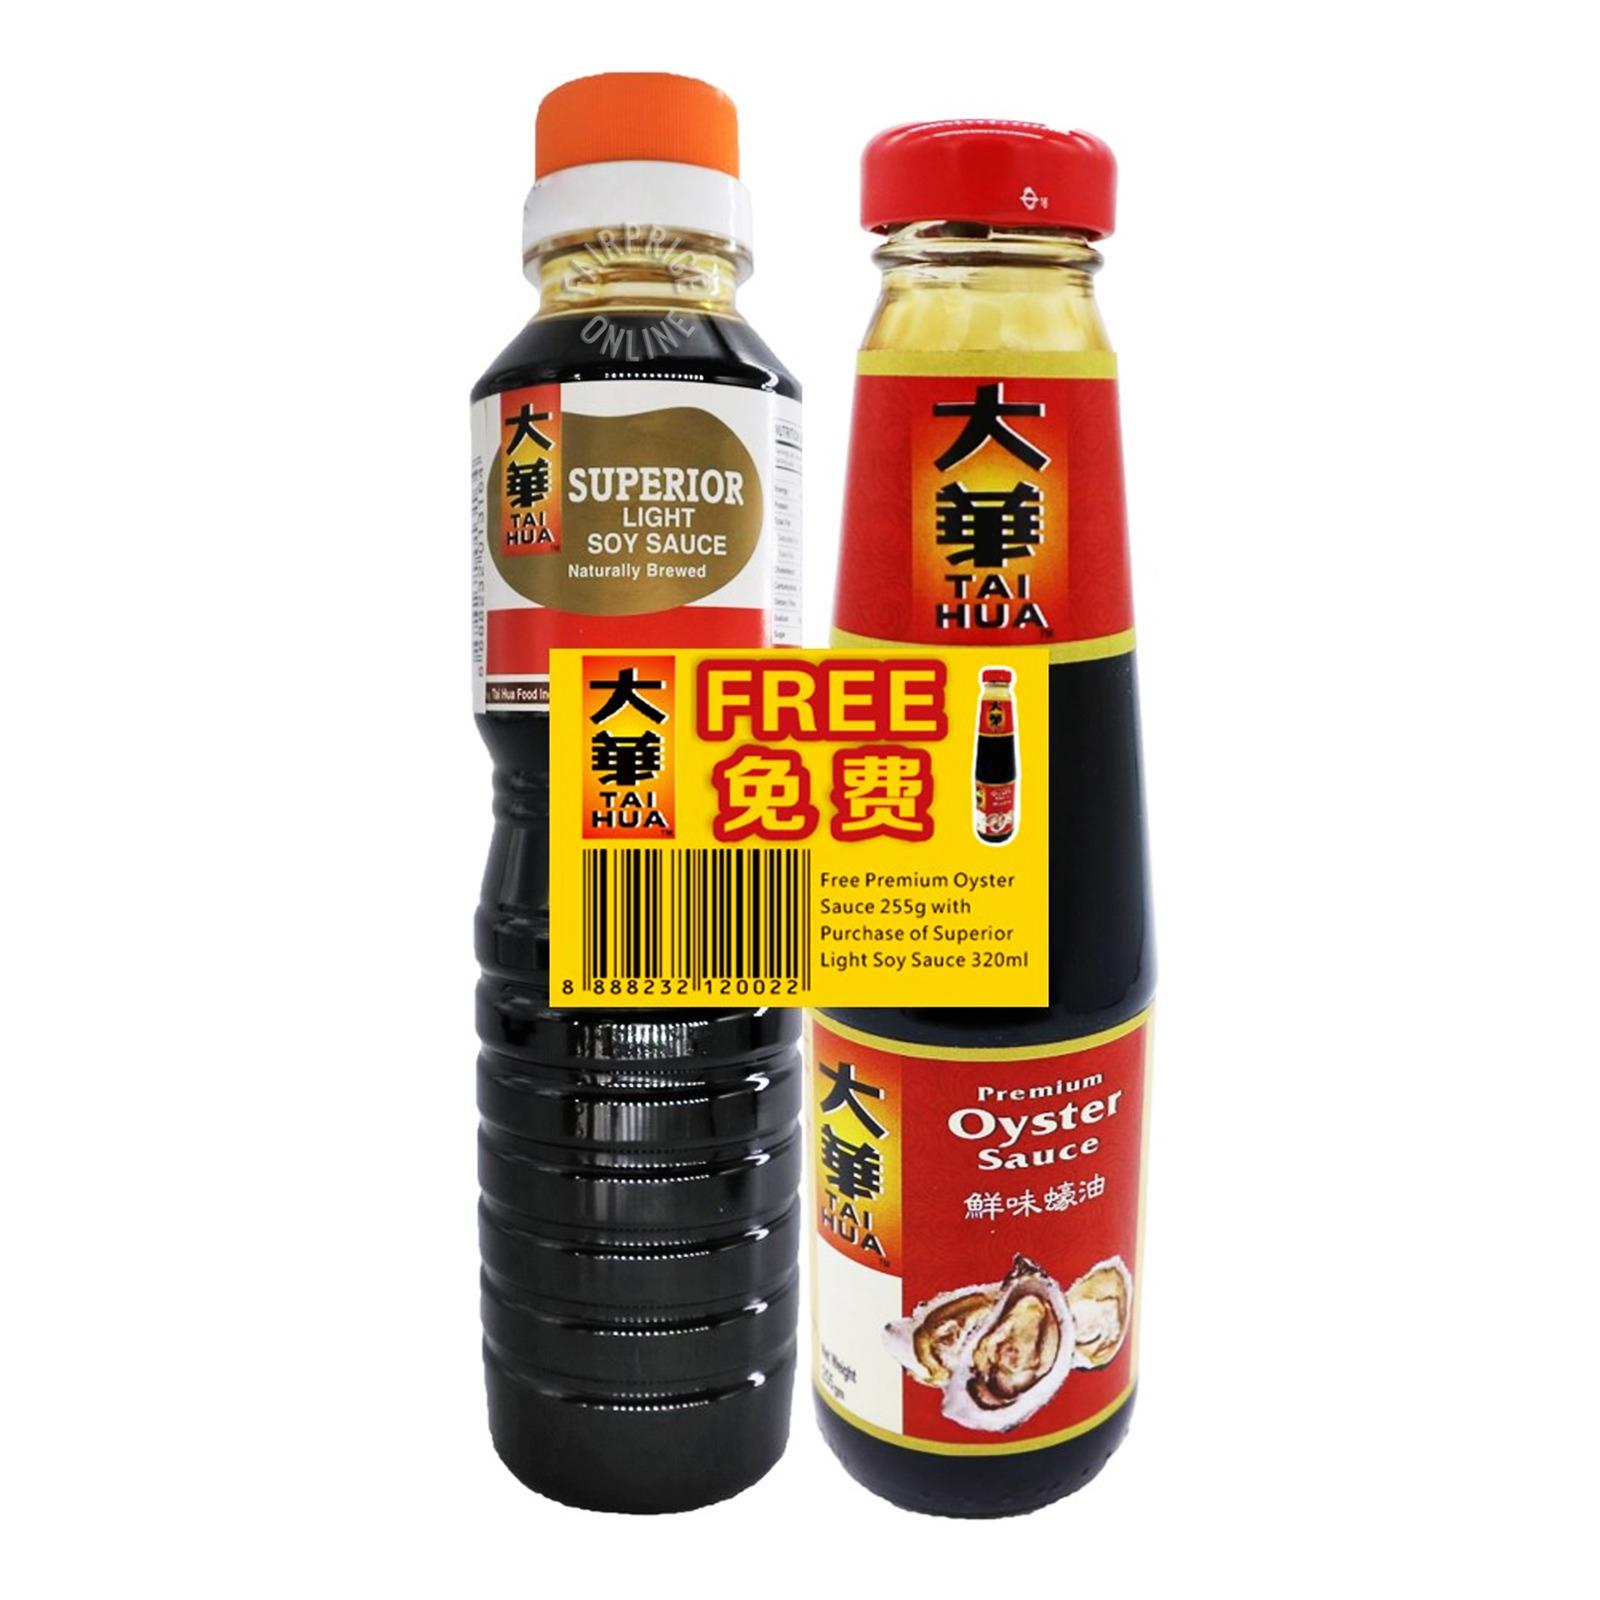 Tai Hua Superior Soya Sauce - Light + Oyster Sauce